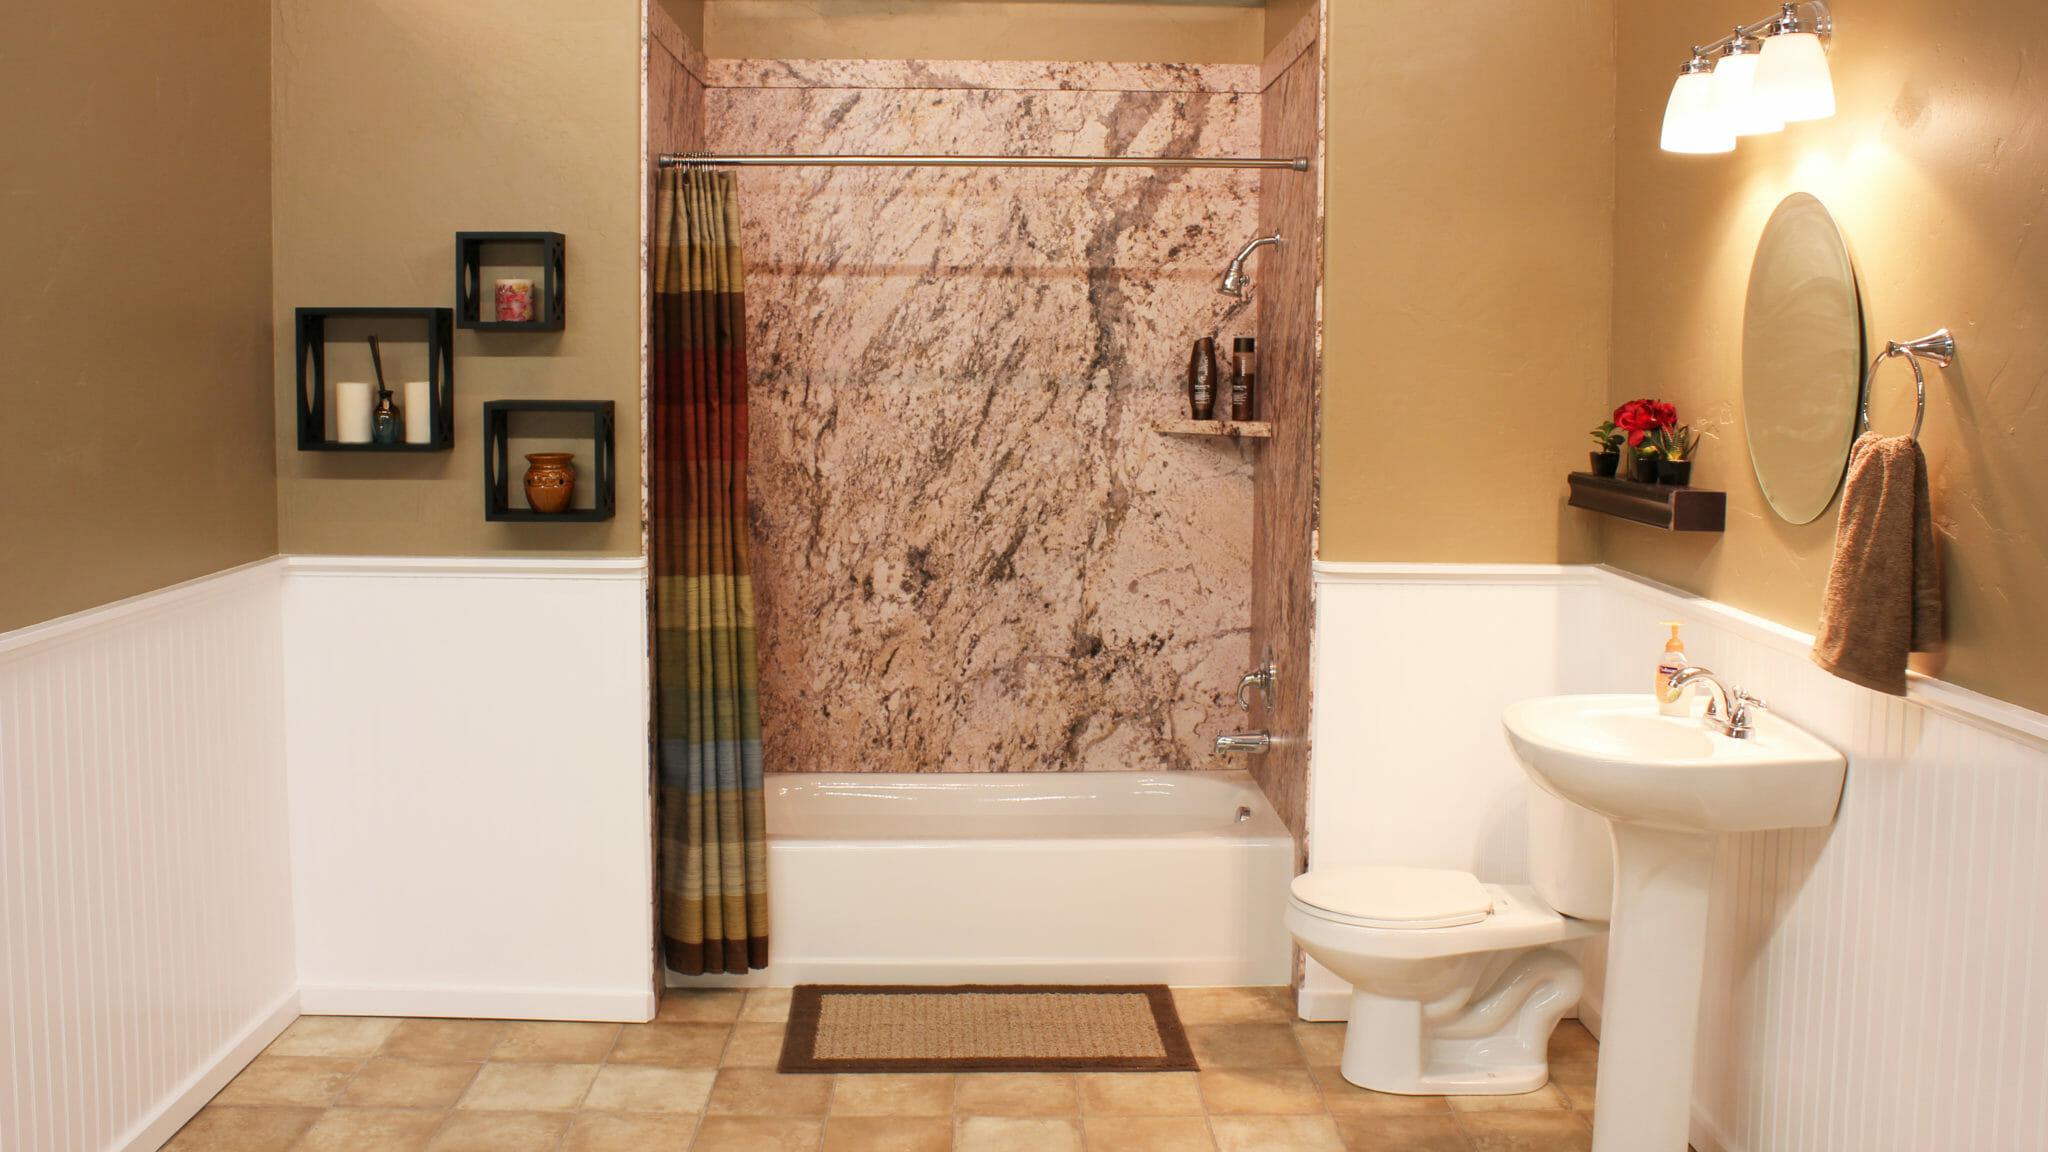 Flush Your Bathroom Troubles Down the Toilet